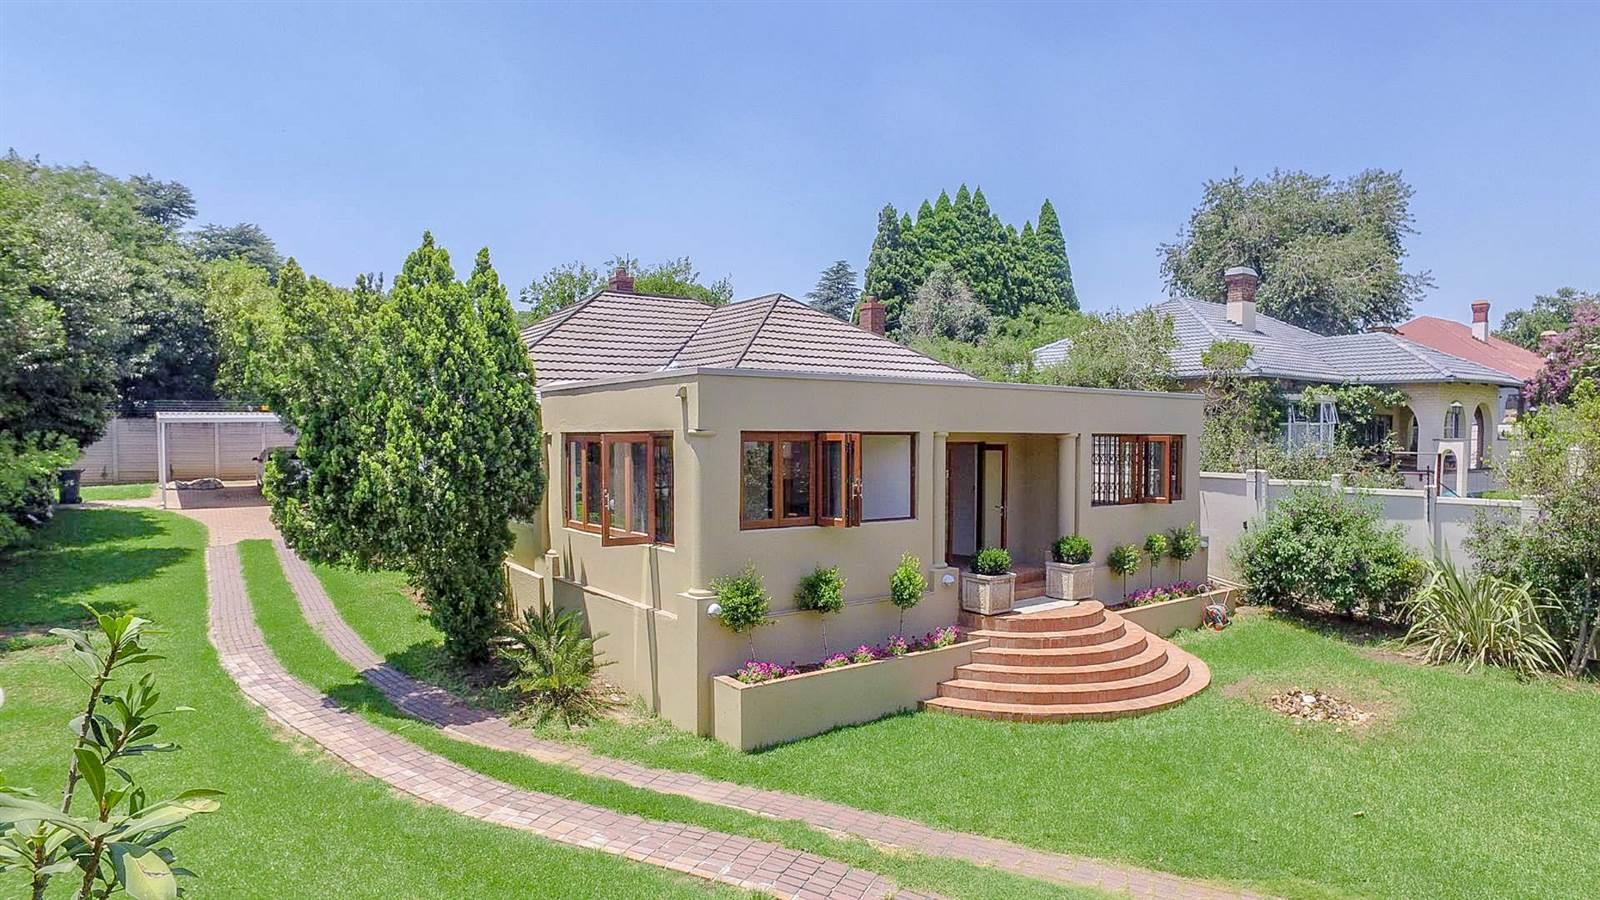 , House, 3 Bedrooms - ZAR 4,500,000